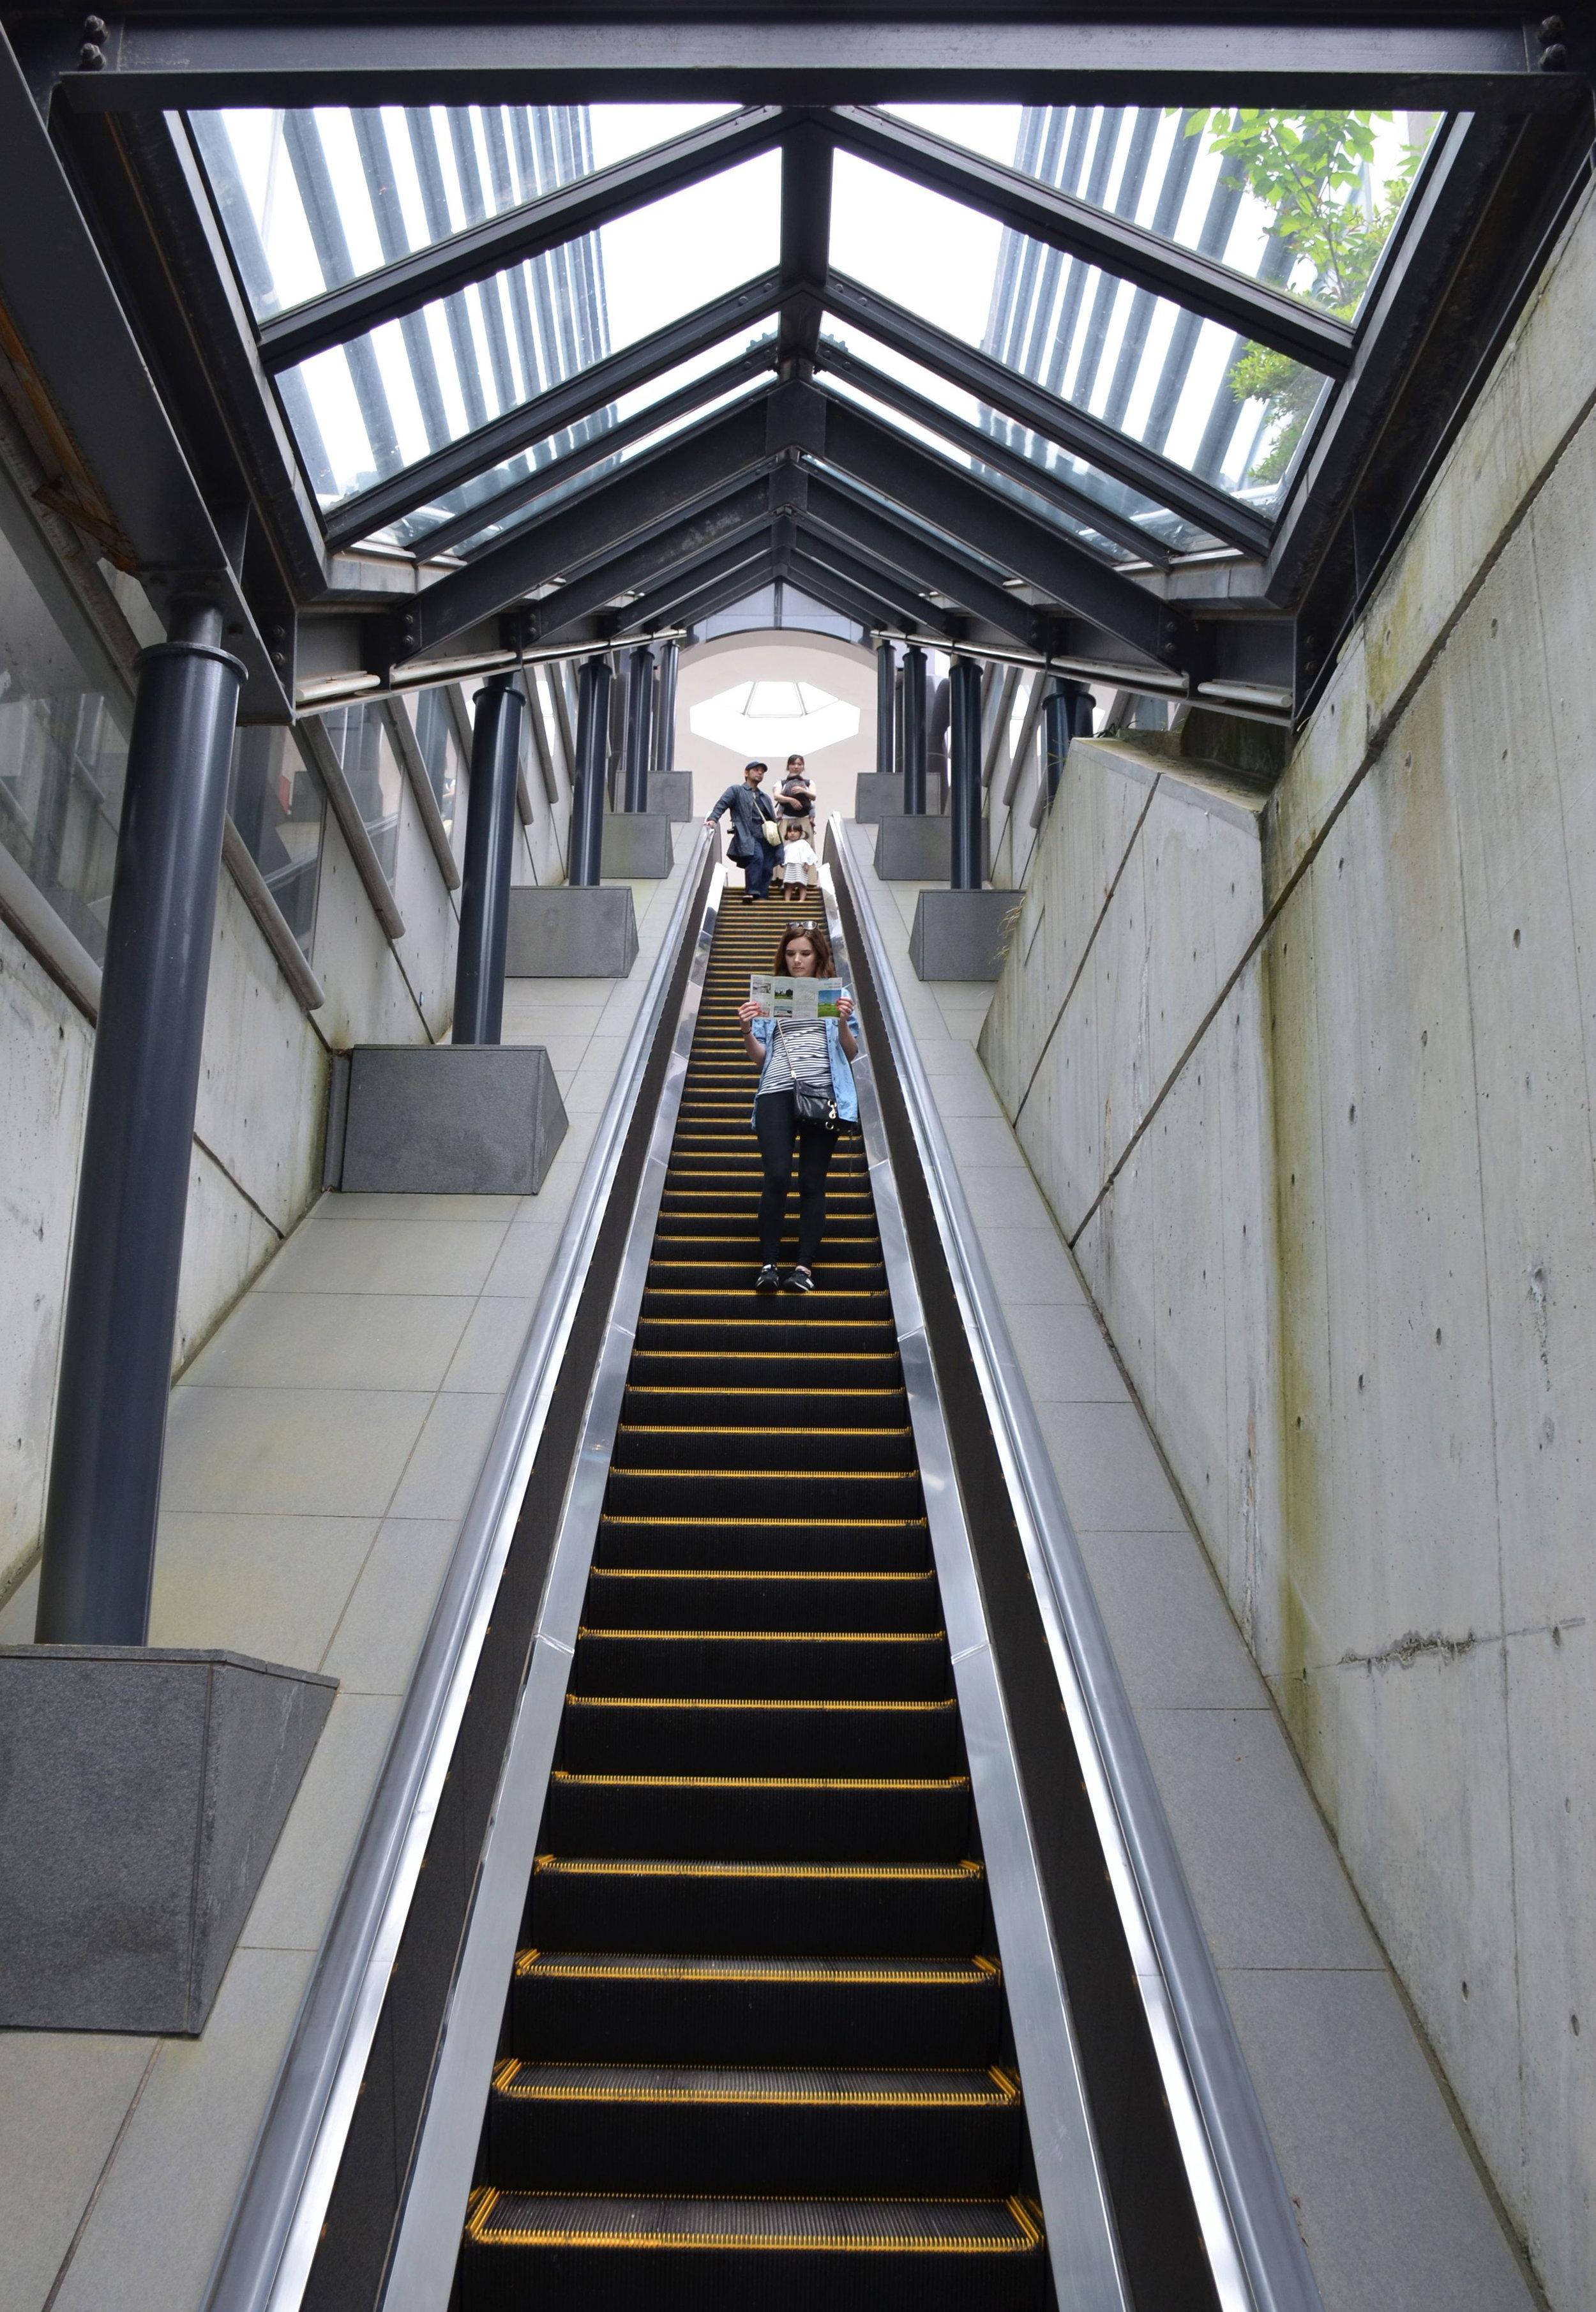 Hakone_Openair_museum.jpg